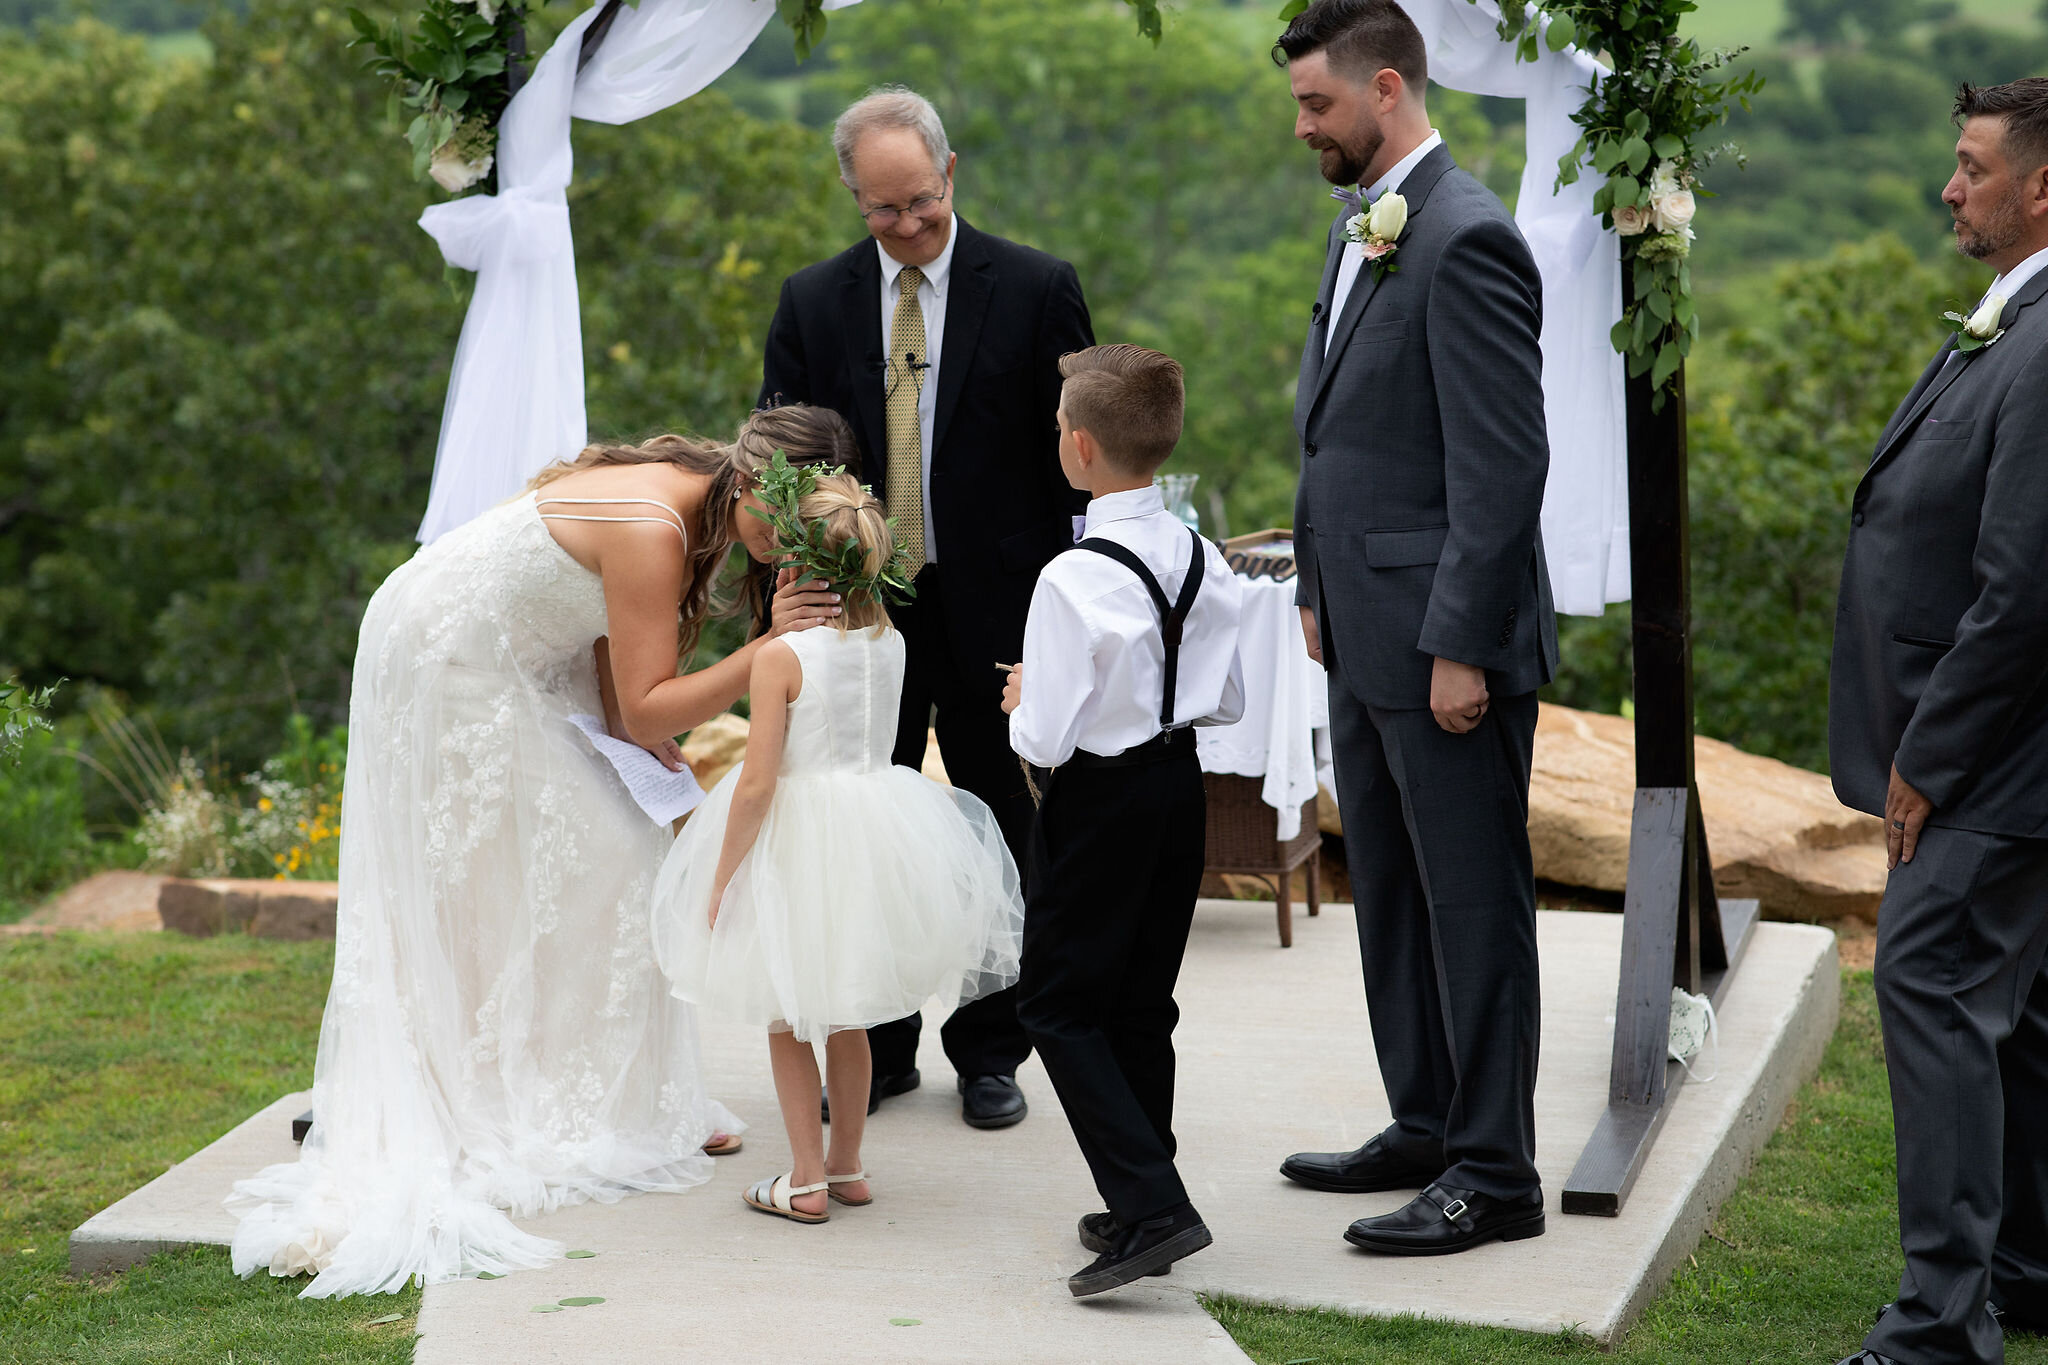 Oklahoma Summer Wedding Venue Dream Point Ranch 29.jpg